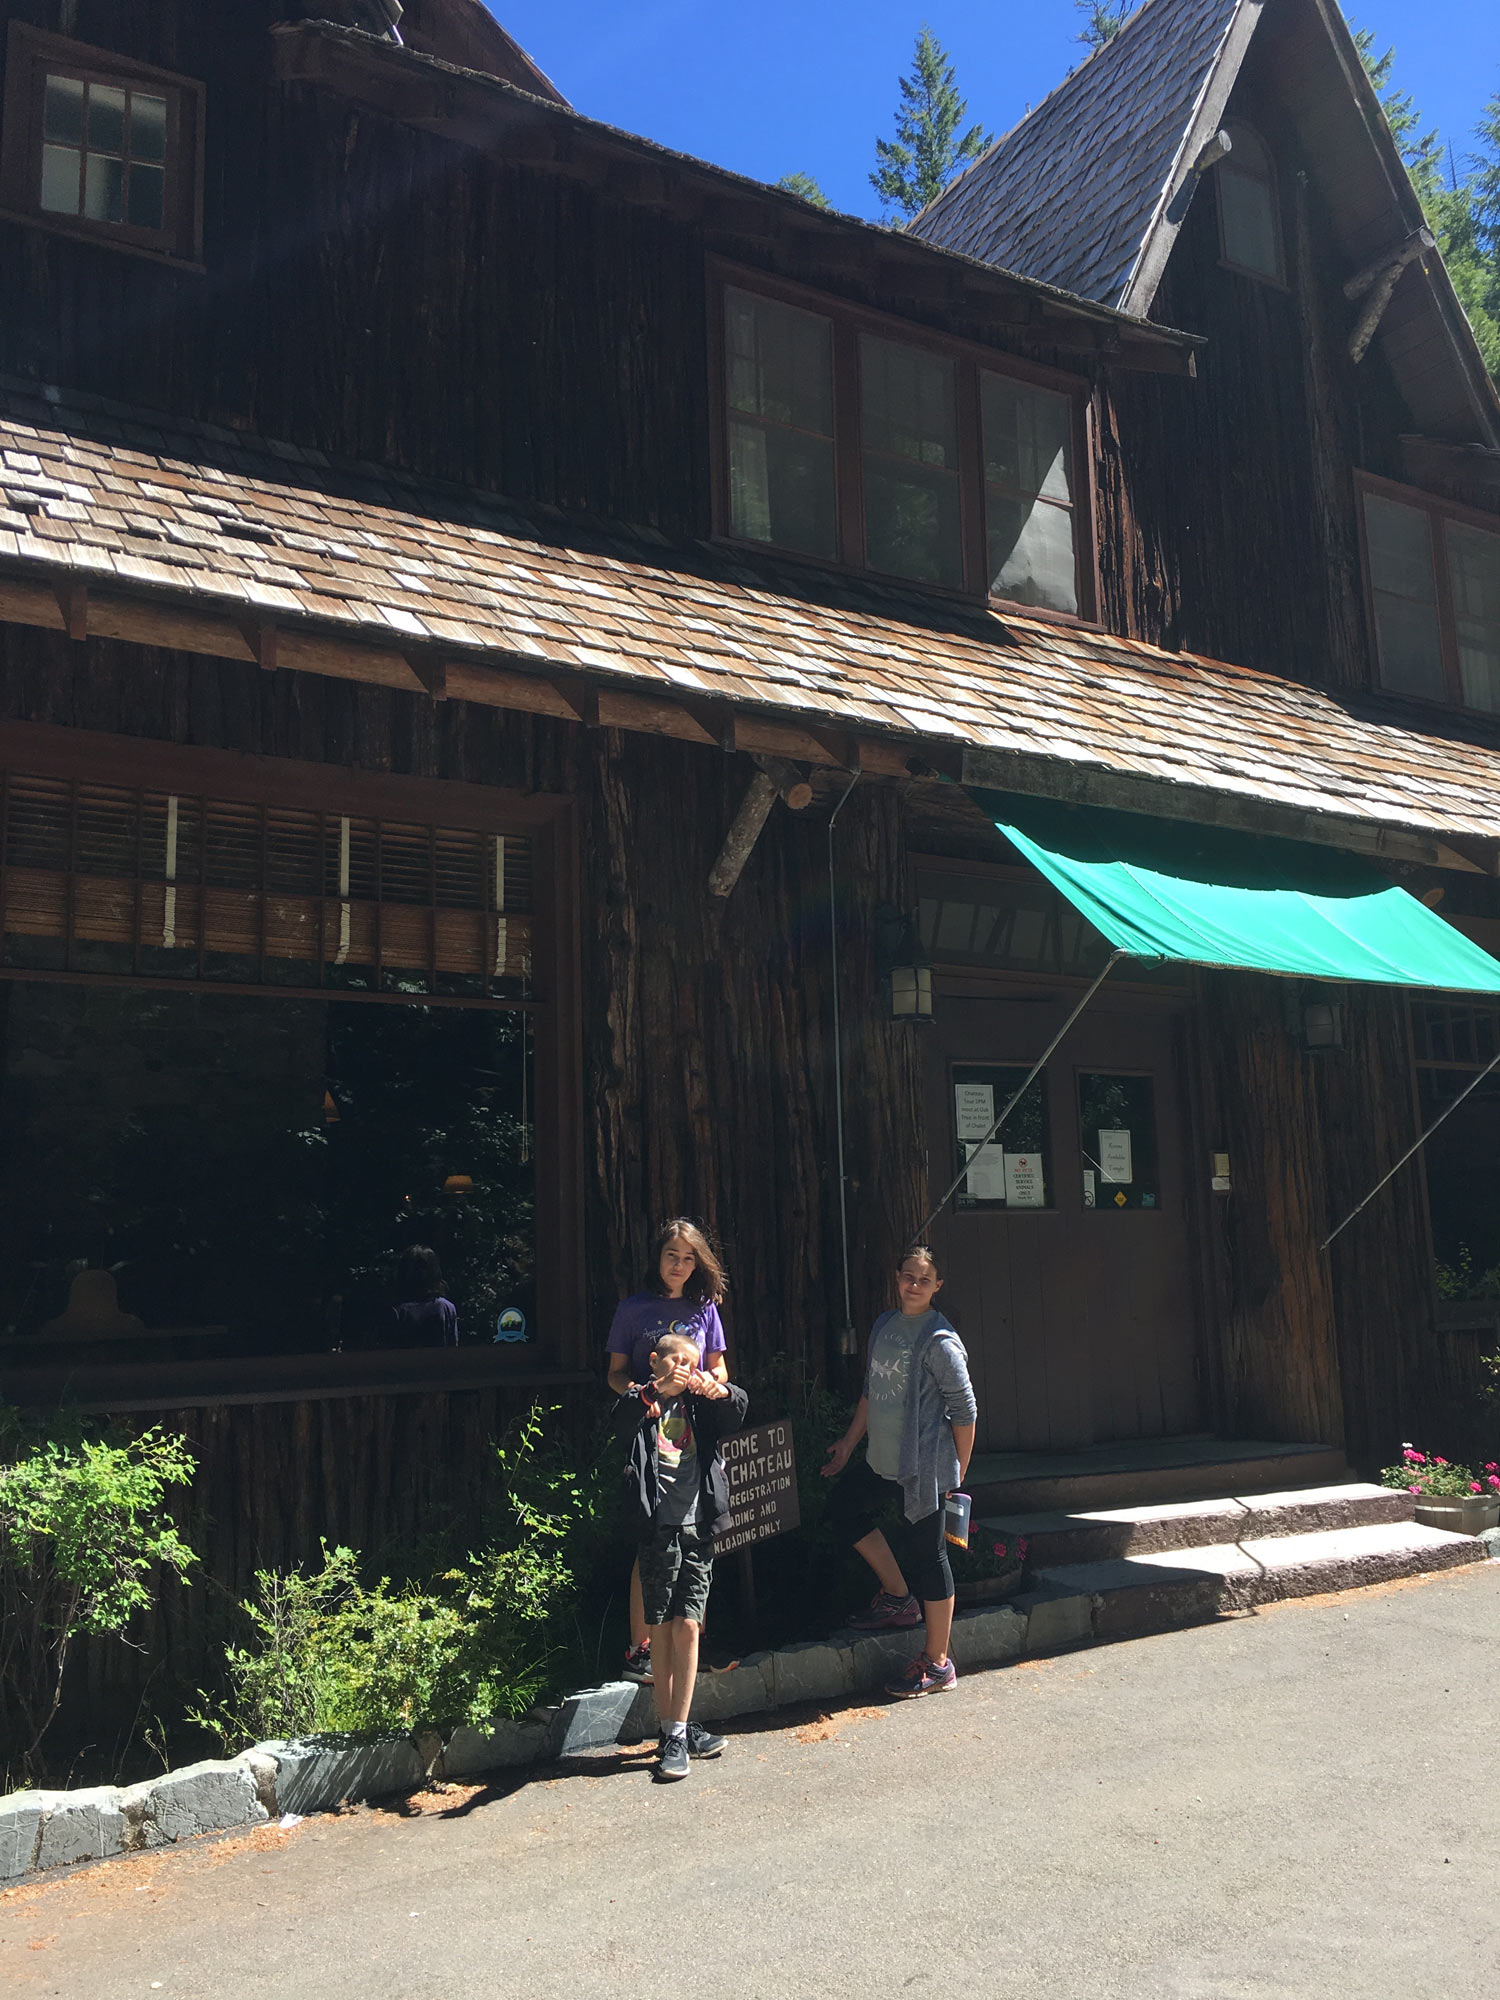 We had a wonderful stay at Oregon Caves Chateau.